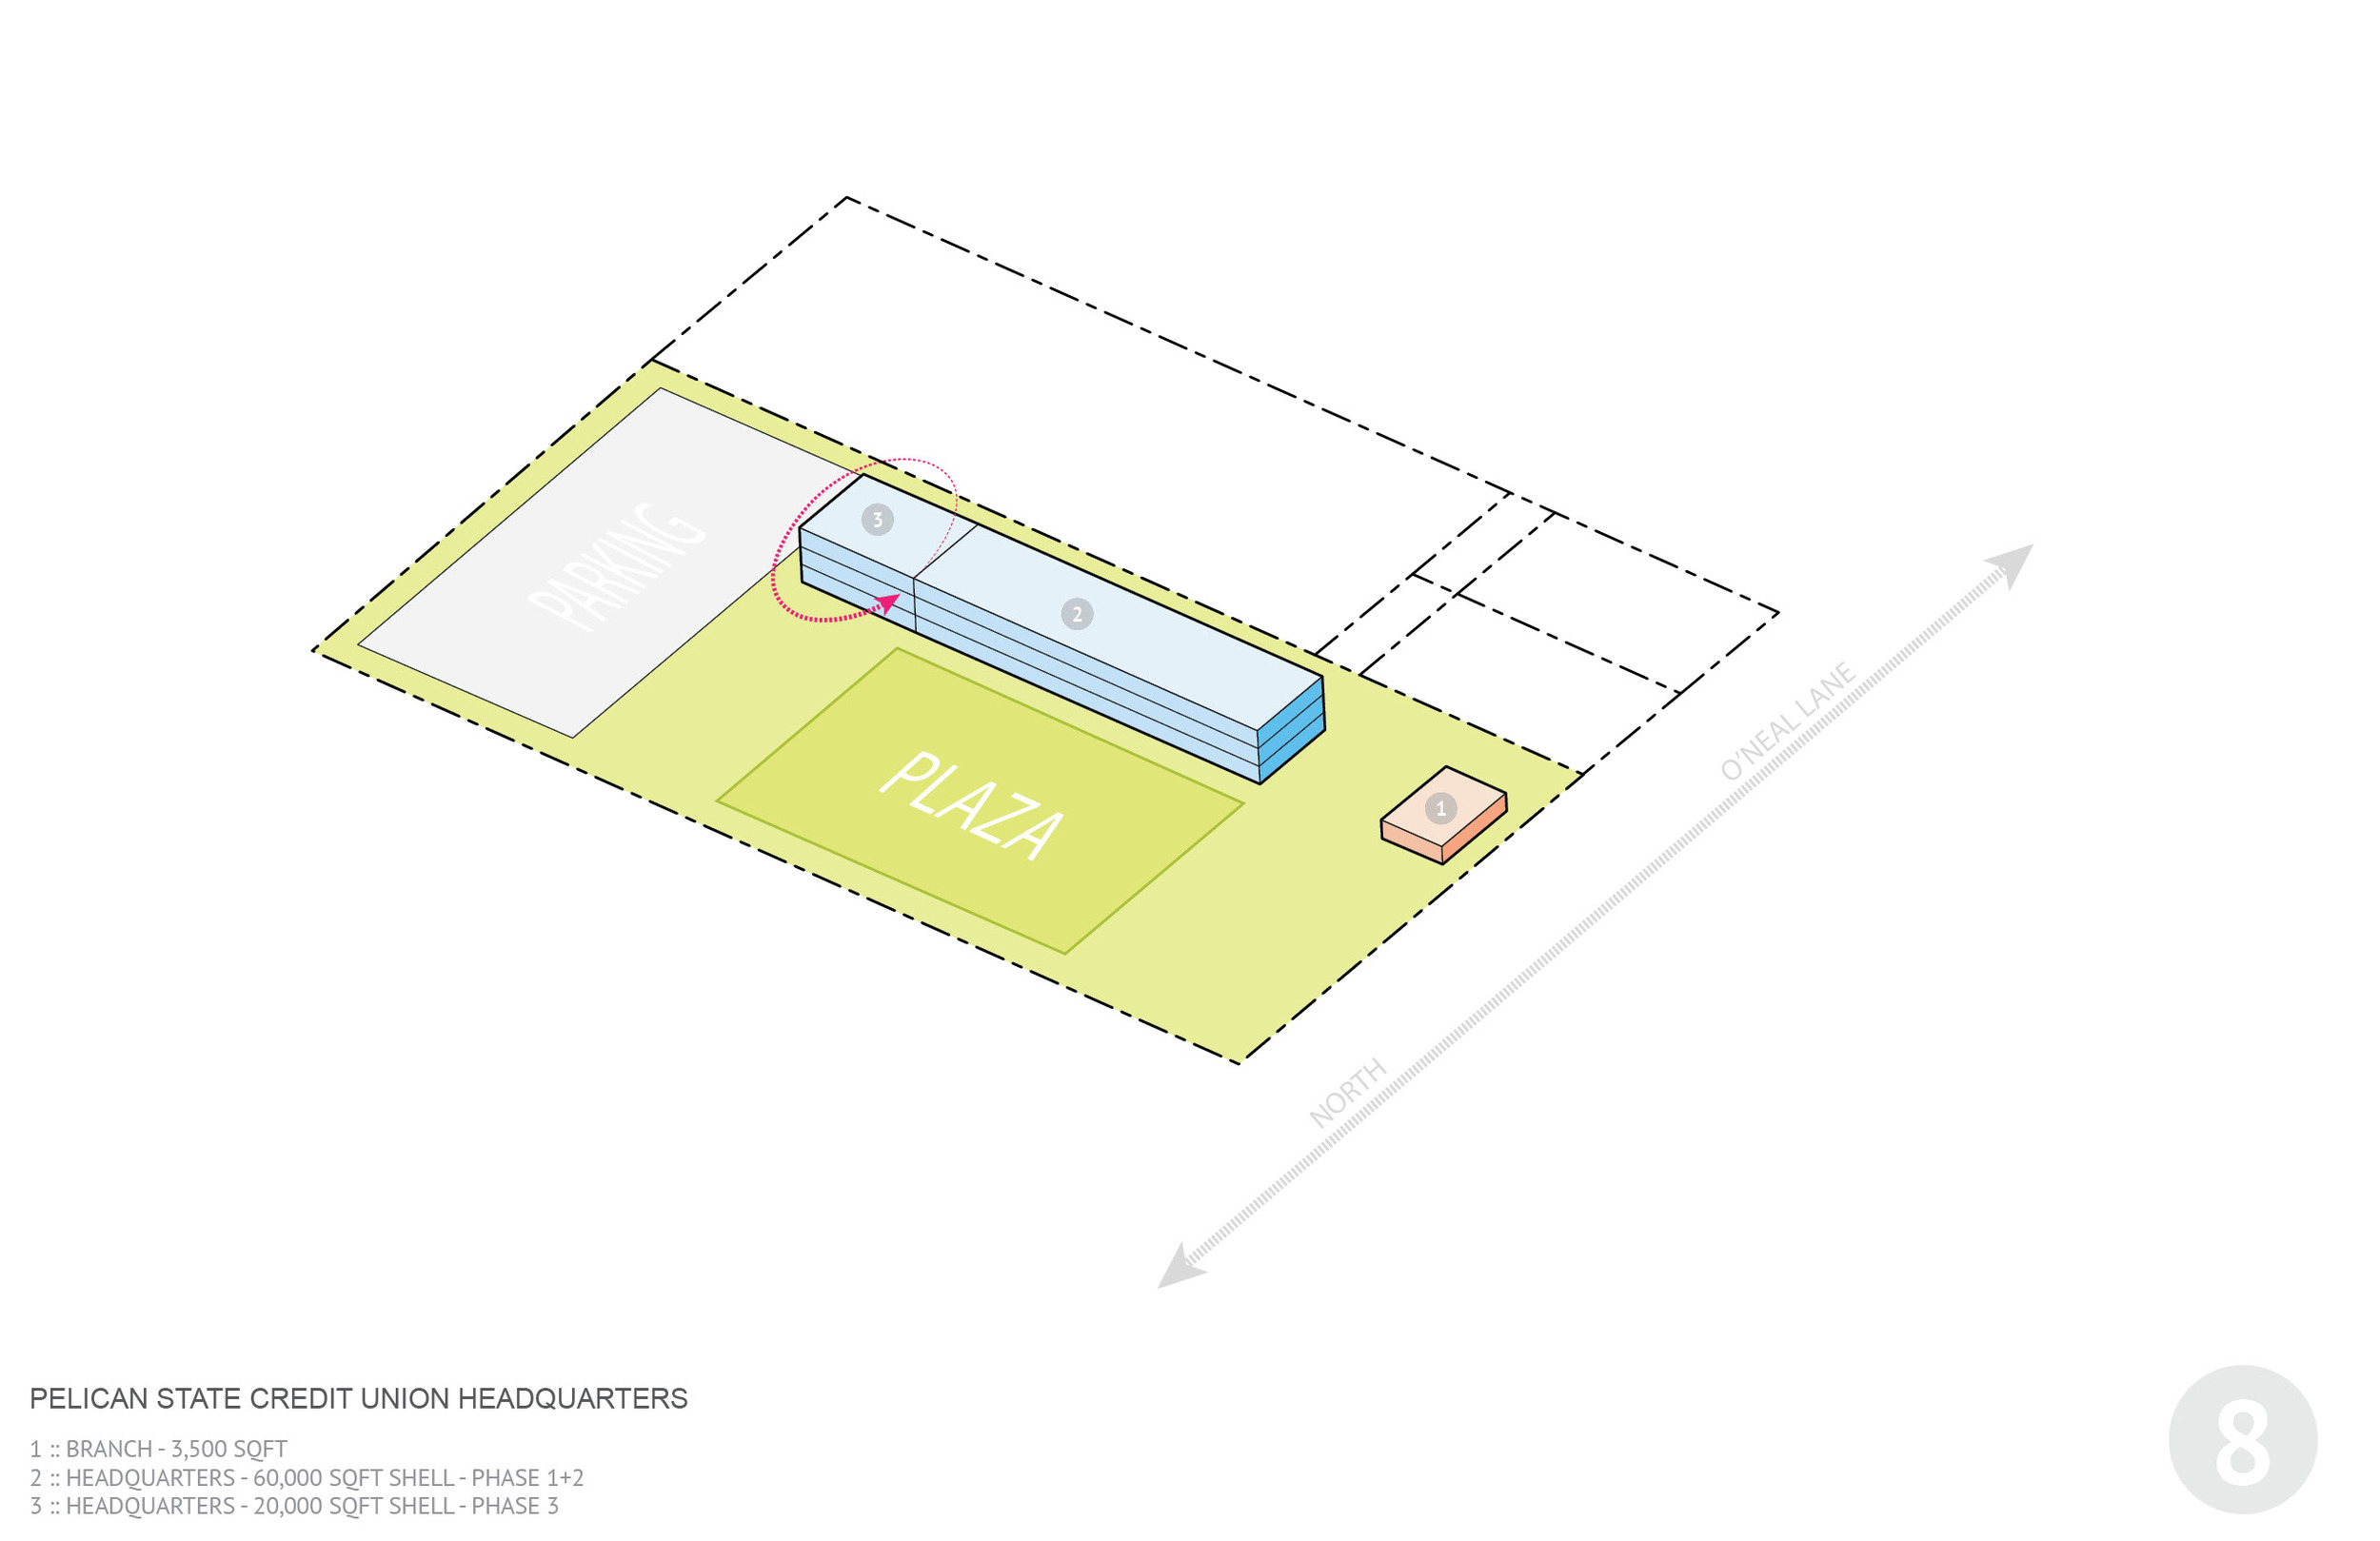 A_SlideshowDiagram_8.jpg